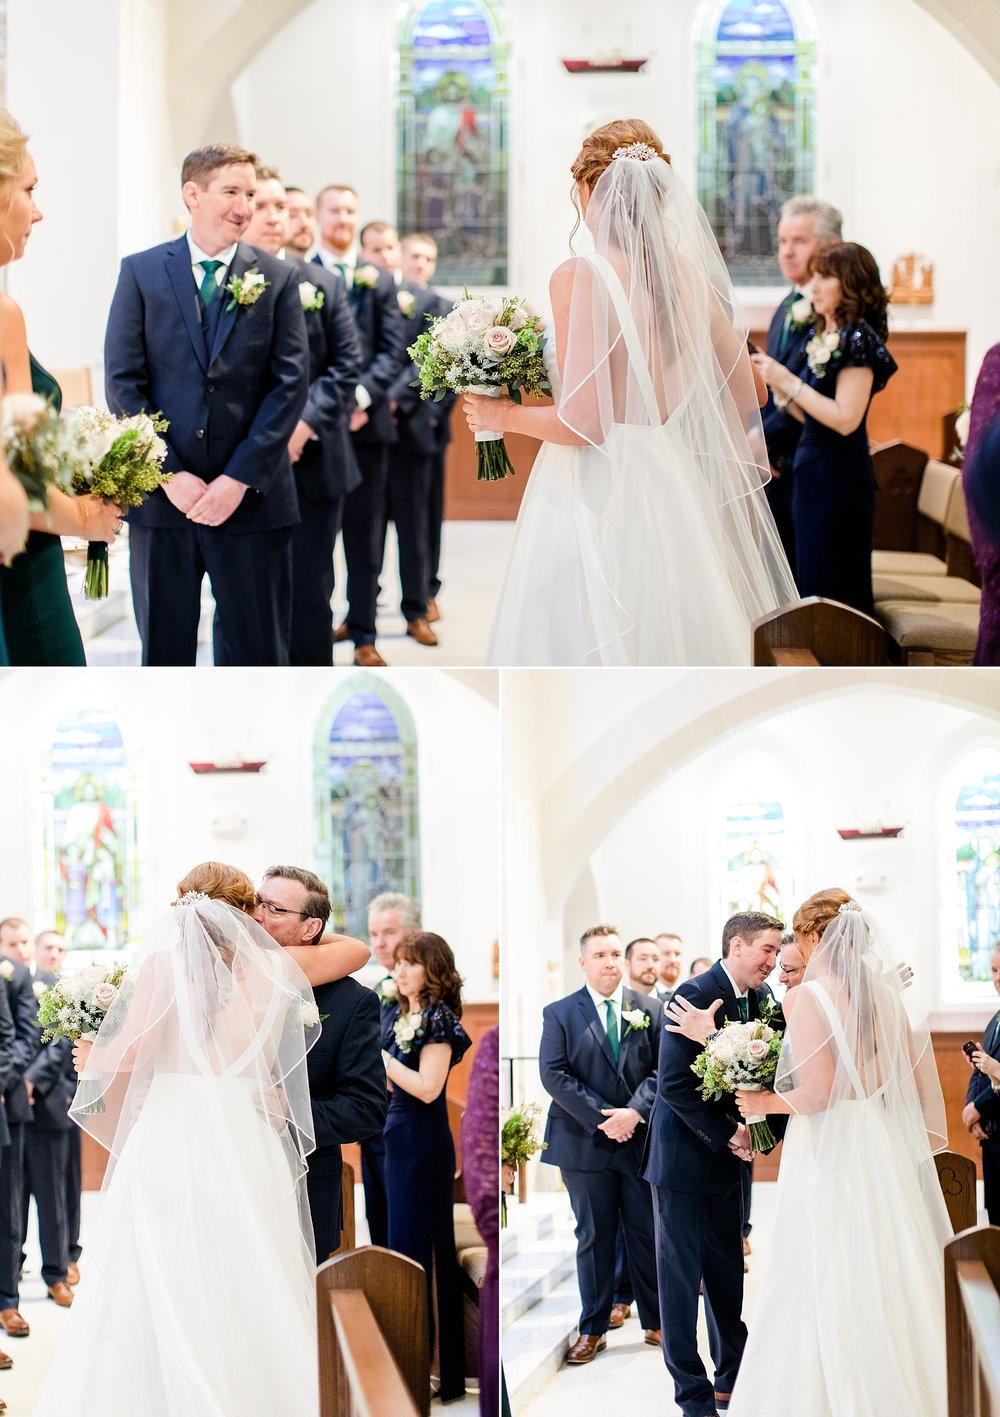 eisleyimages-irish-wedding-boston-seaport_0066.jpg